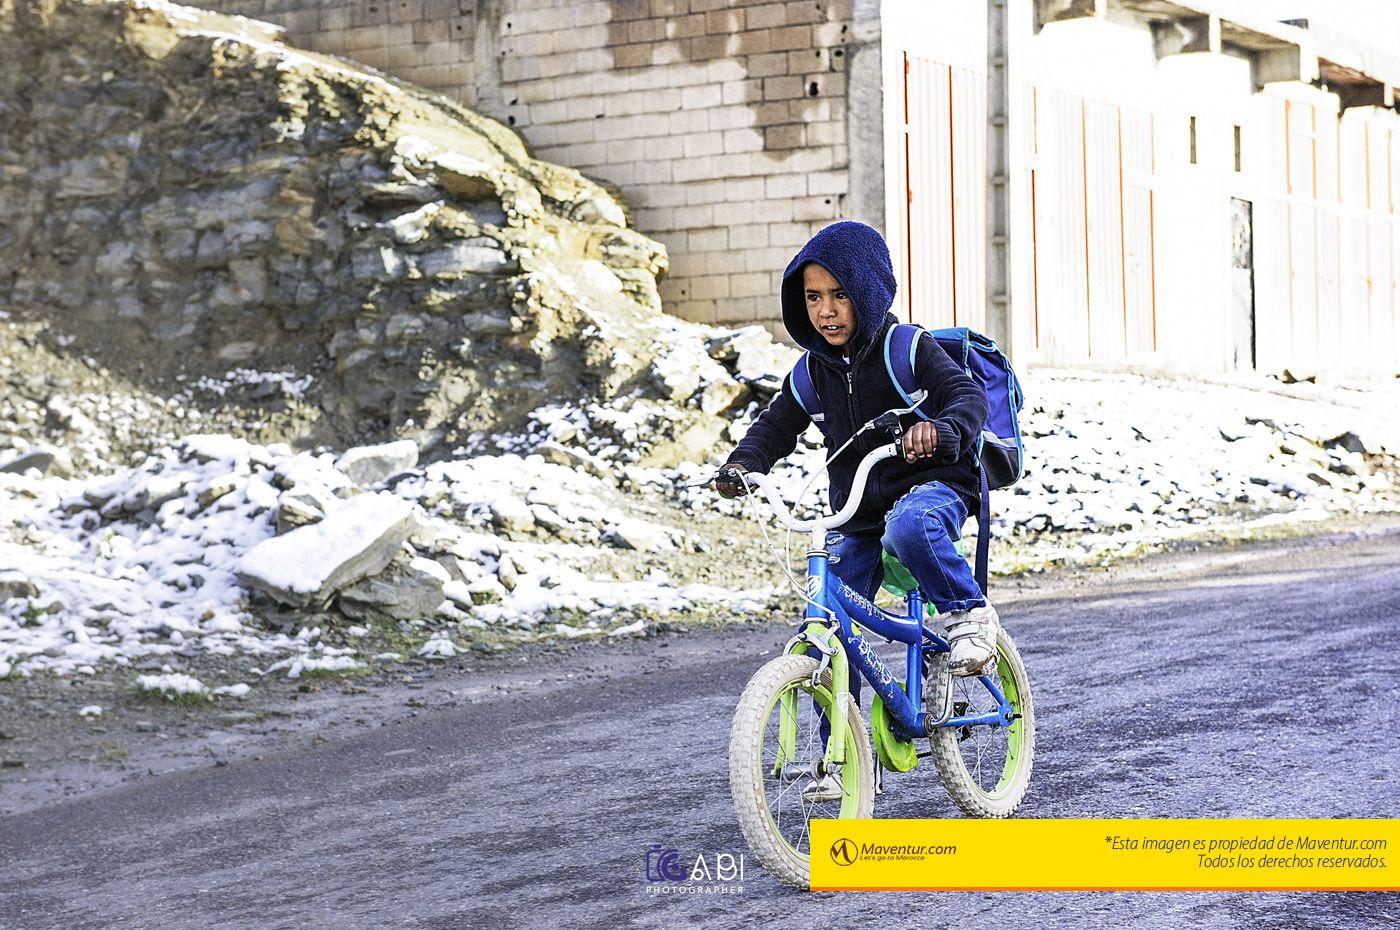 Maventur_viaje_fotografico a marruecos